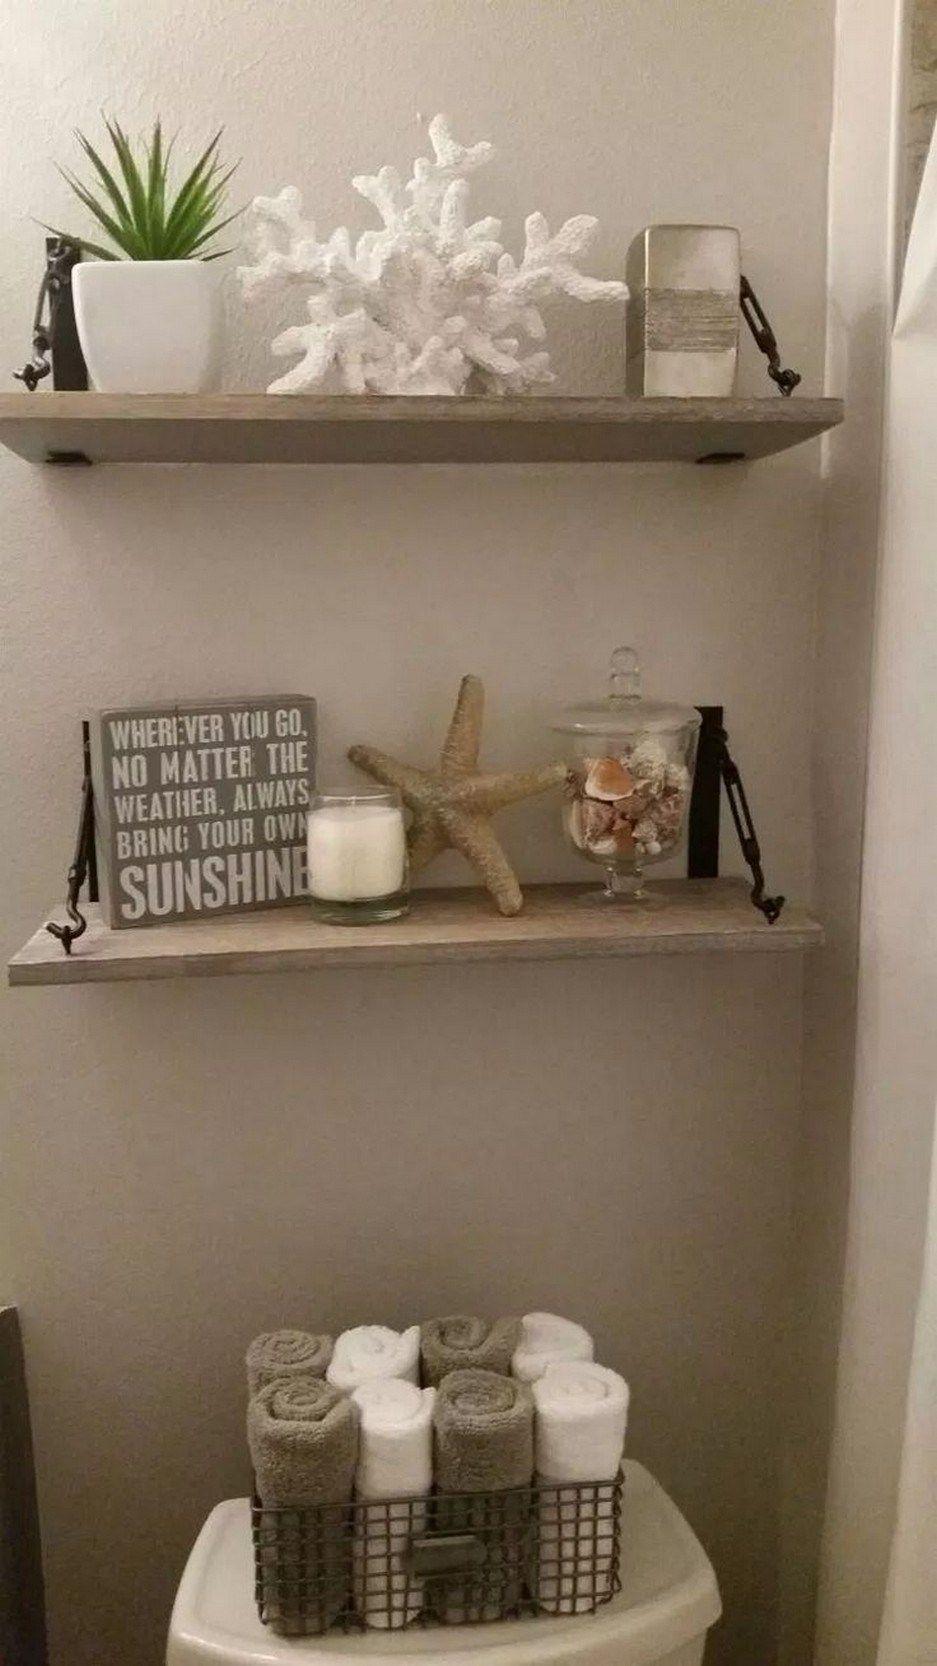 74 Fabulous Farmhouse Rustic Bathroom Shelves Storage Ideas